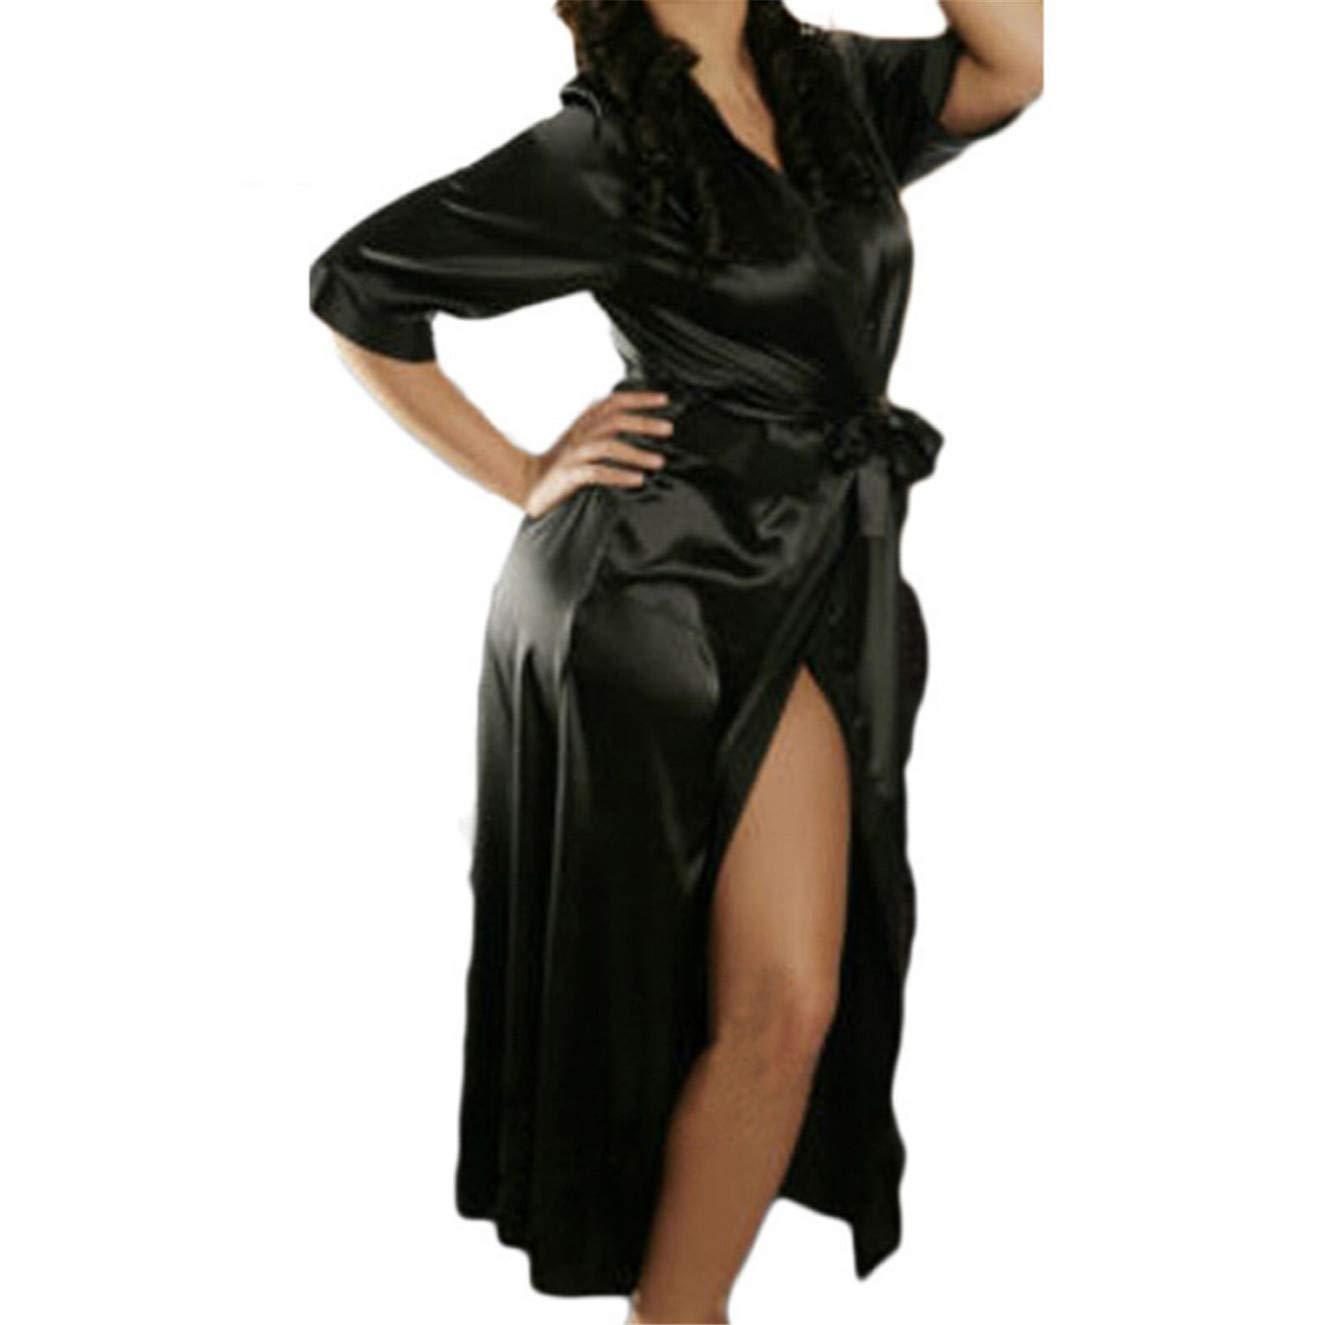 TIFENNY Women's Sexy Satin Ice Silk Bath Robe Babydoll Lingerie Nightdress Underwear Bathrobe Long Dress Black